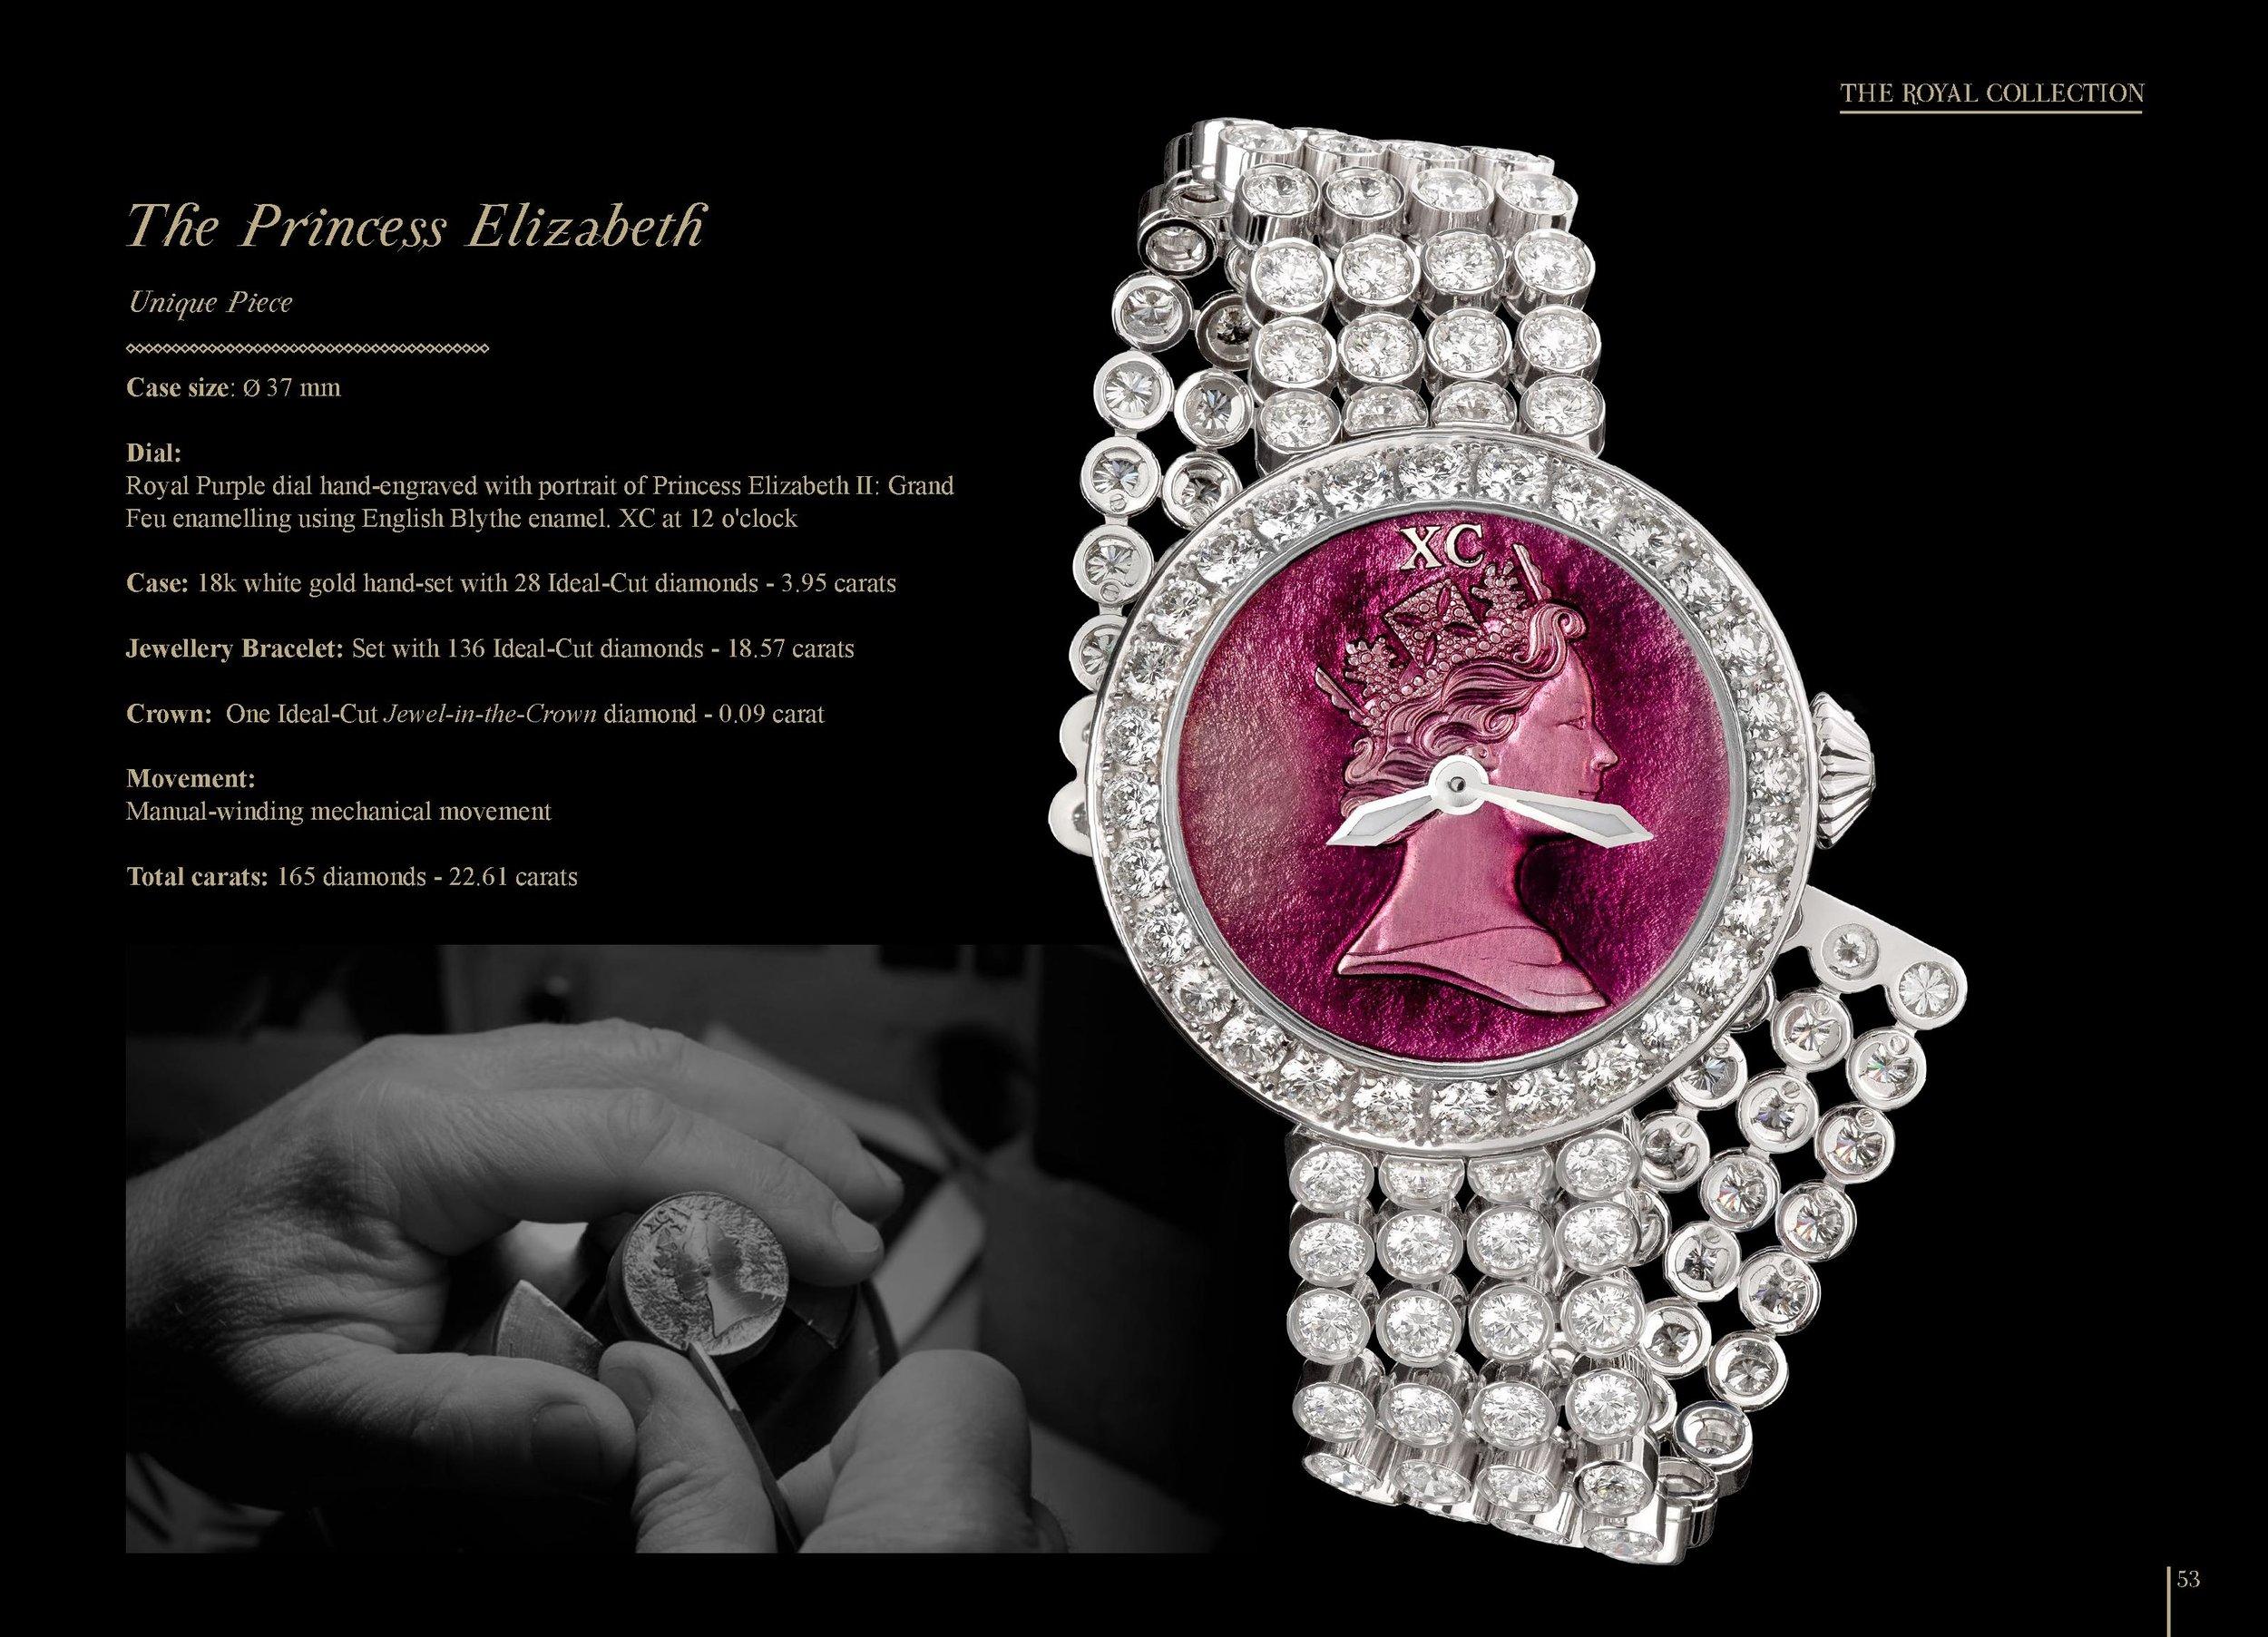 The Princess Elizabeth iconic diamond watch